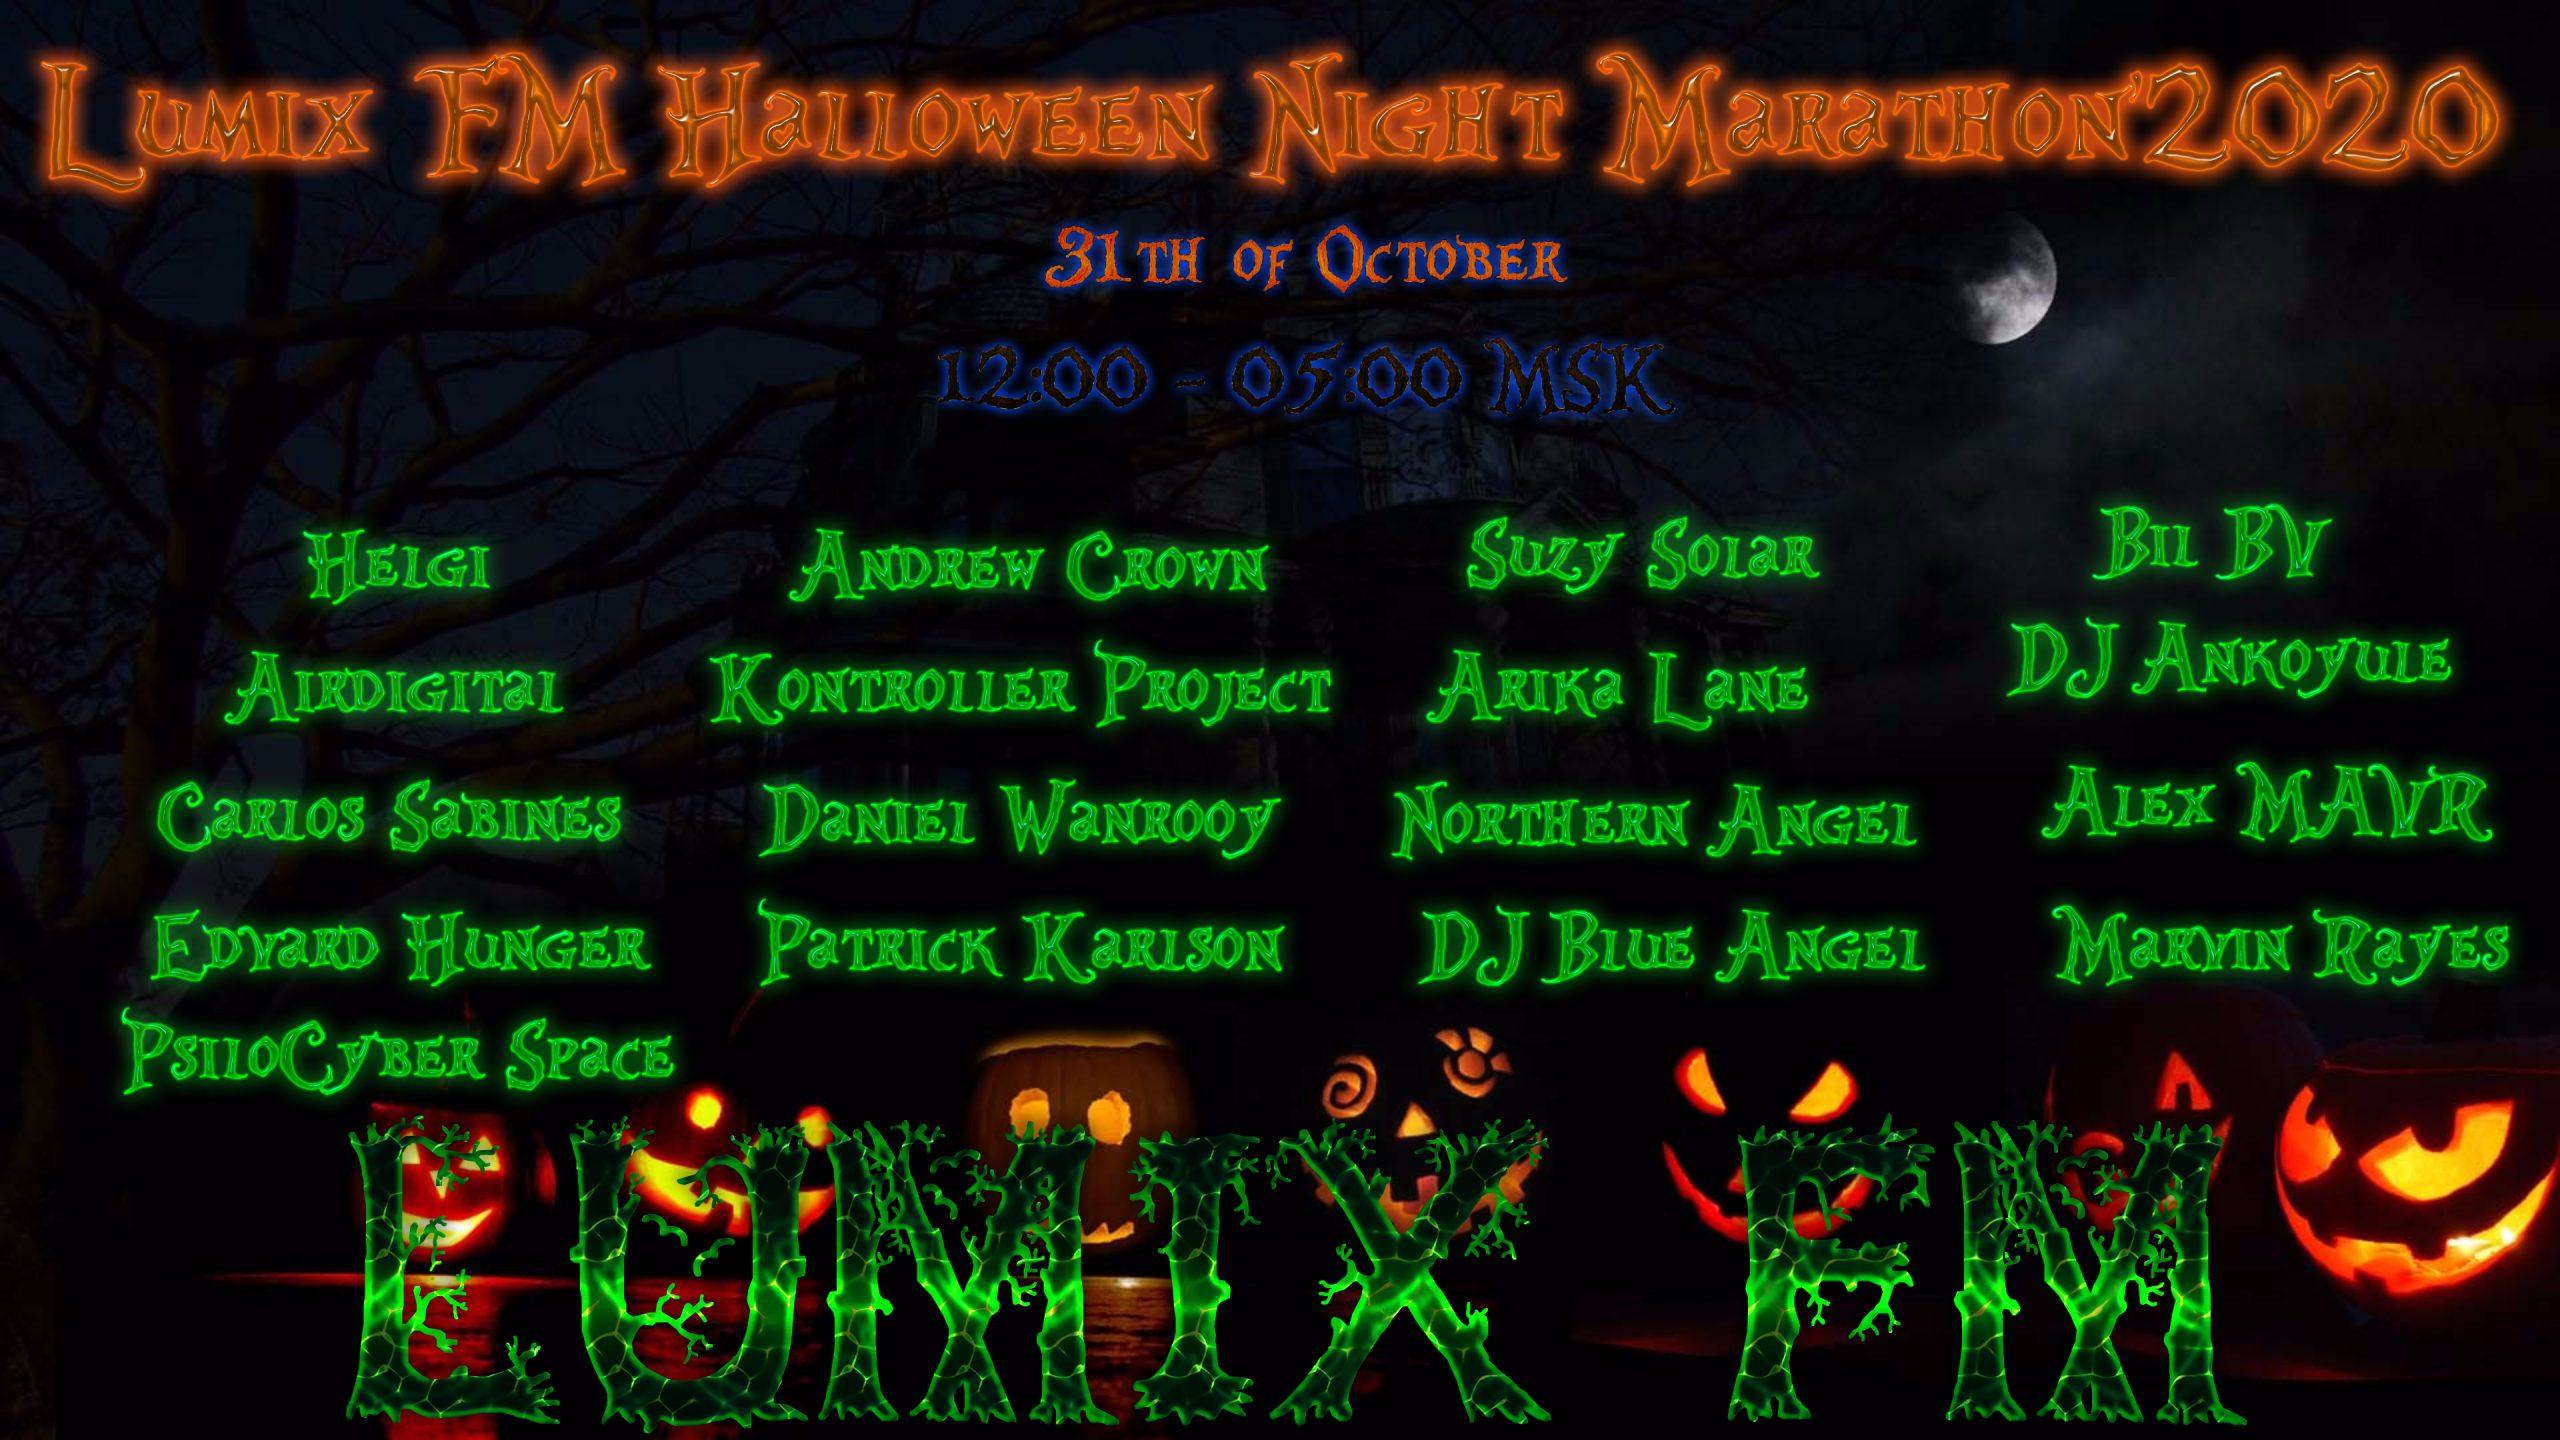 halloween2020_Lumixfm